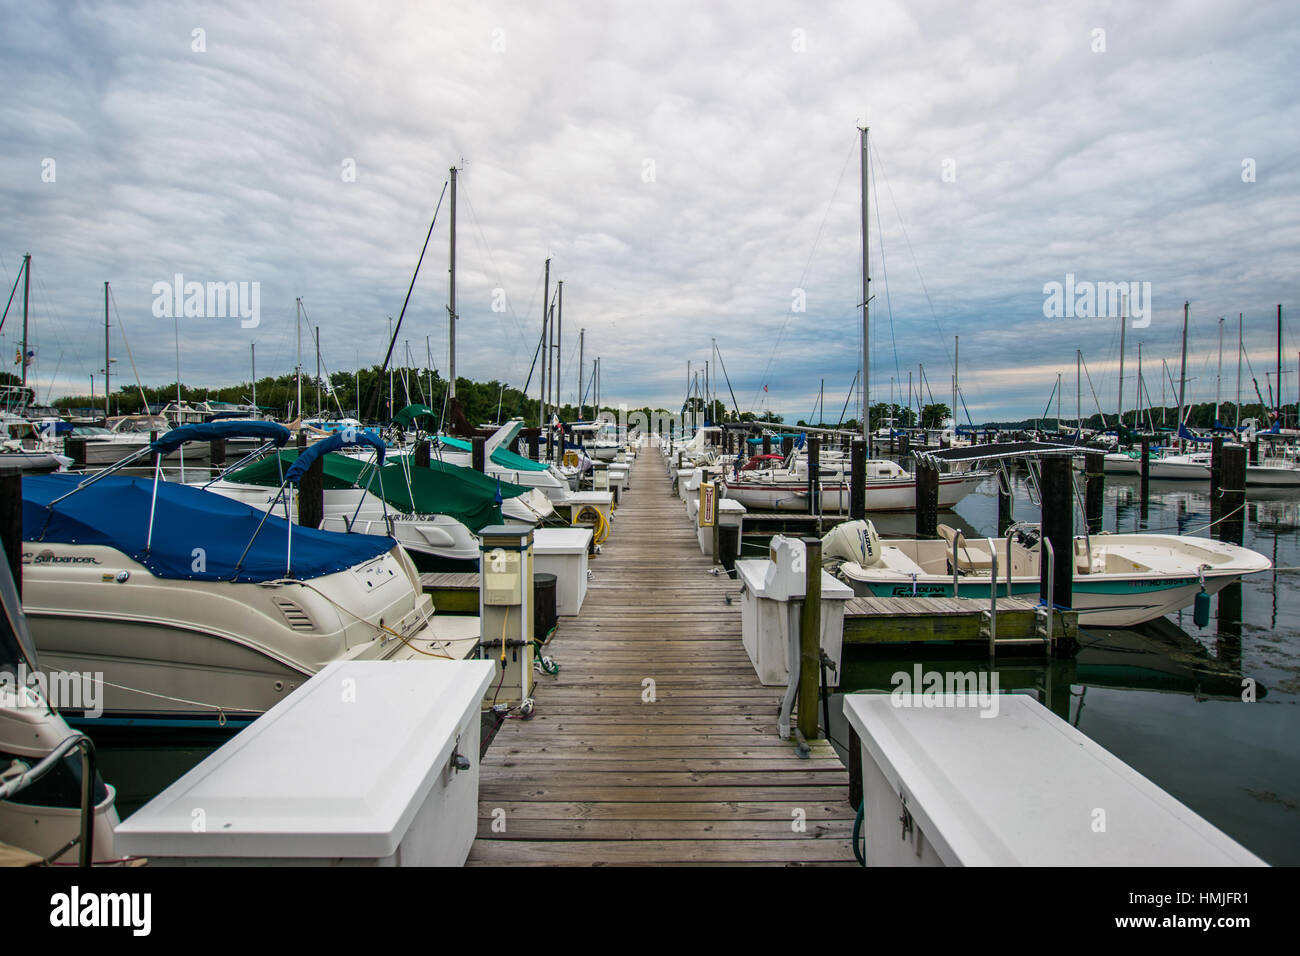 Warm Cloudy day in Havre De Grace, Maryland on the Board